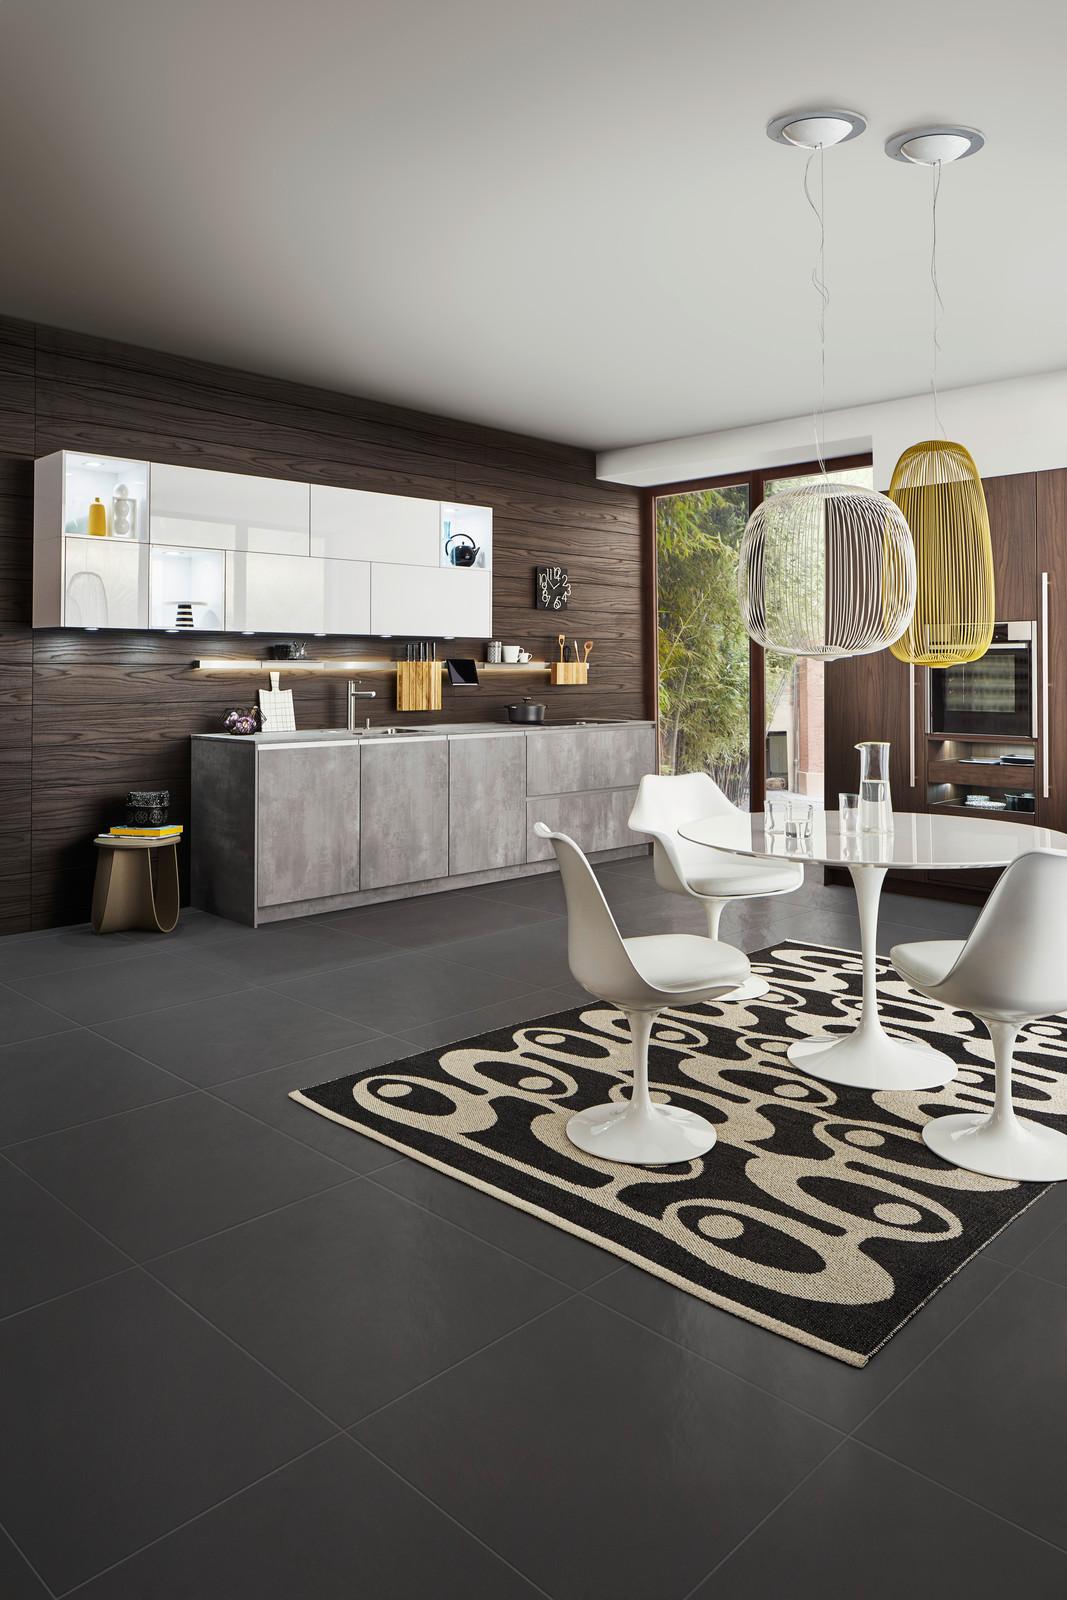 ... Warmly Lit Seating Alcove FIND MORE European Style Kitchen Cabinets  ORANGE COUNTY IN OUR PORTFOLIO Leicht South Coast Plaza, European Kitchen  Design.